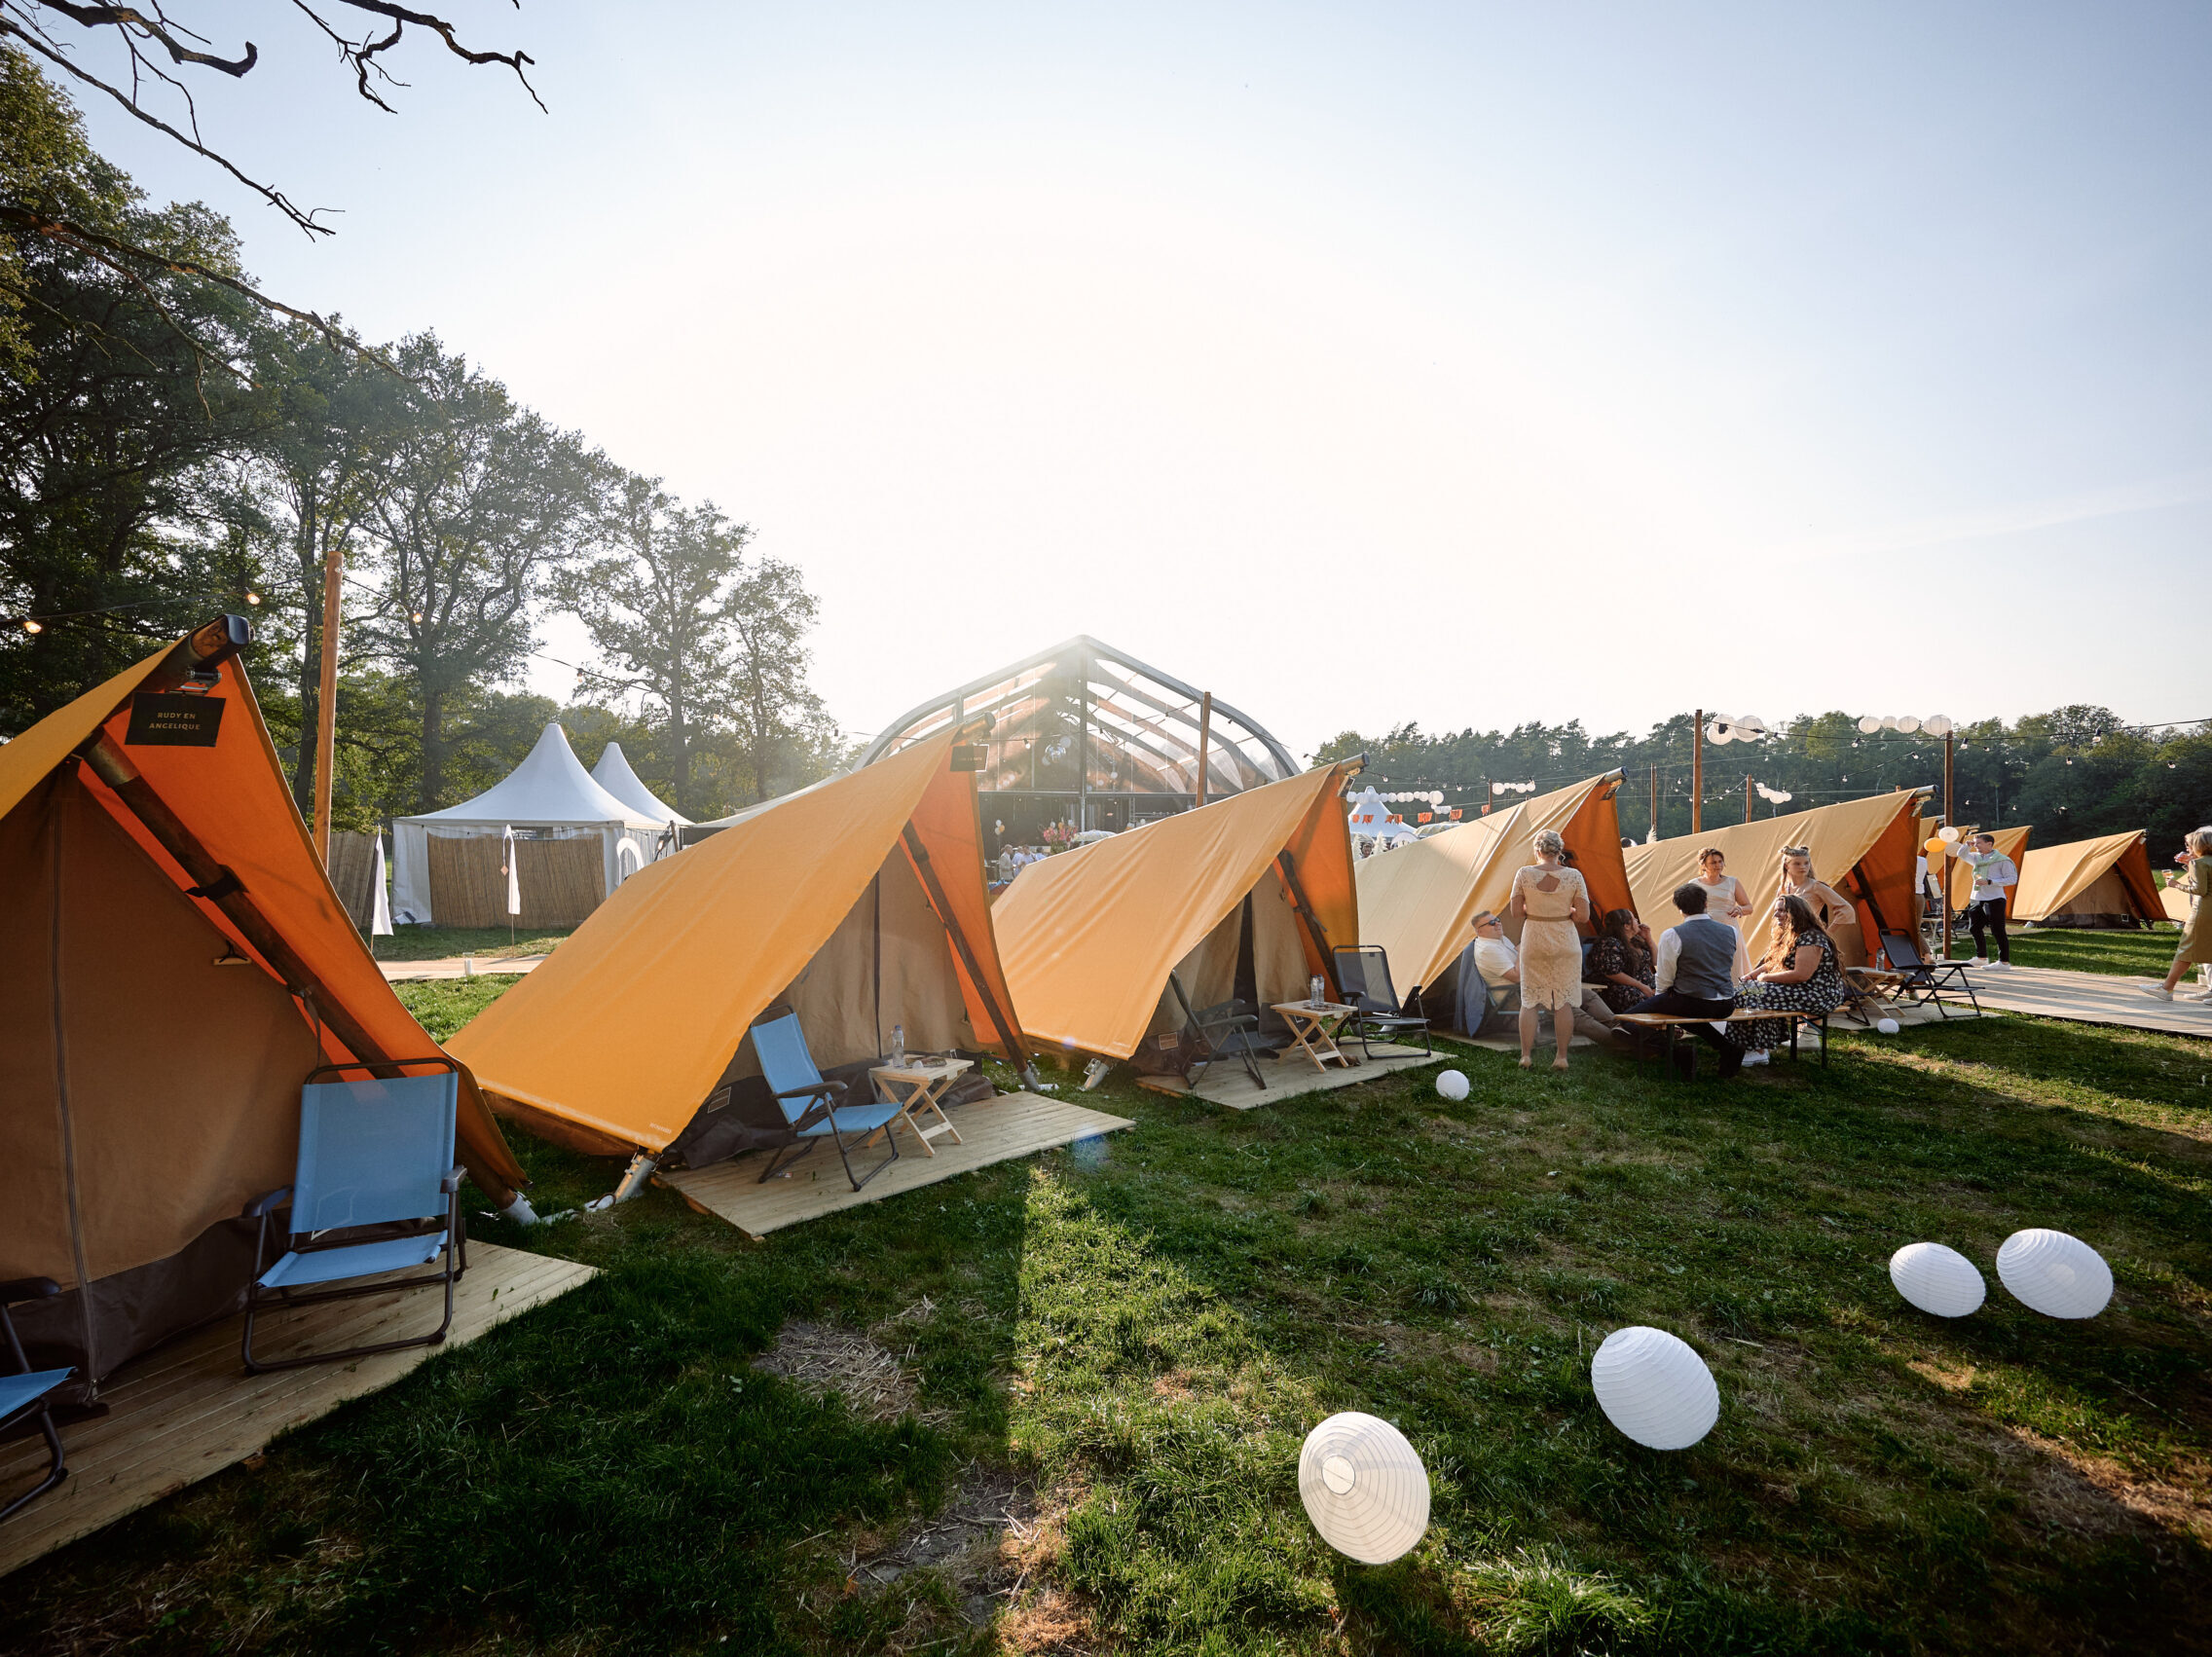 Dreamday Festival